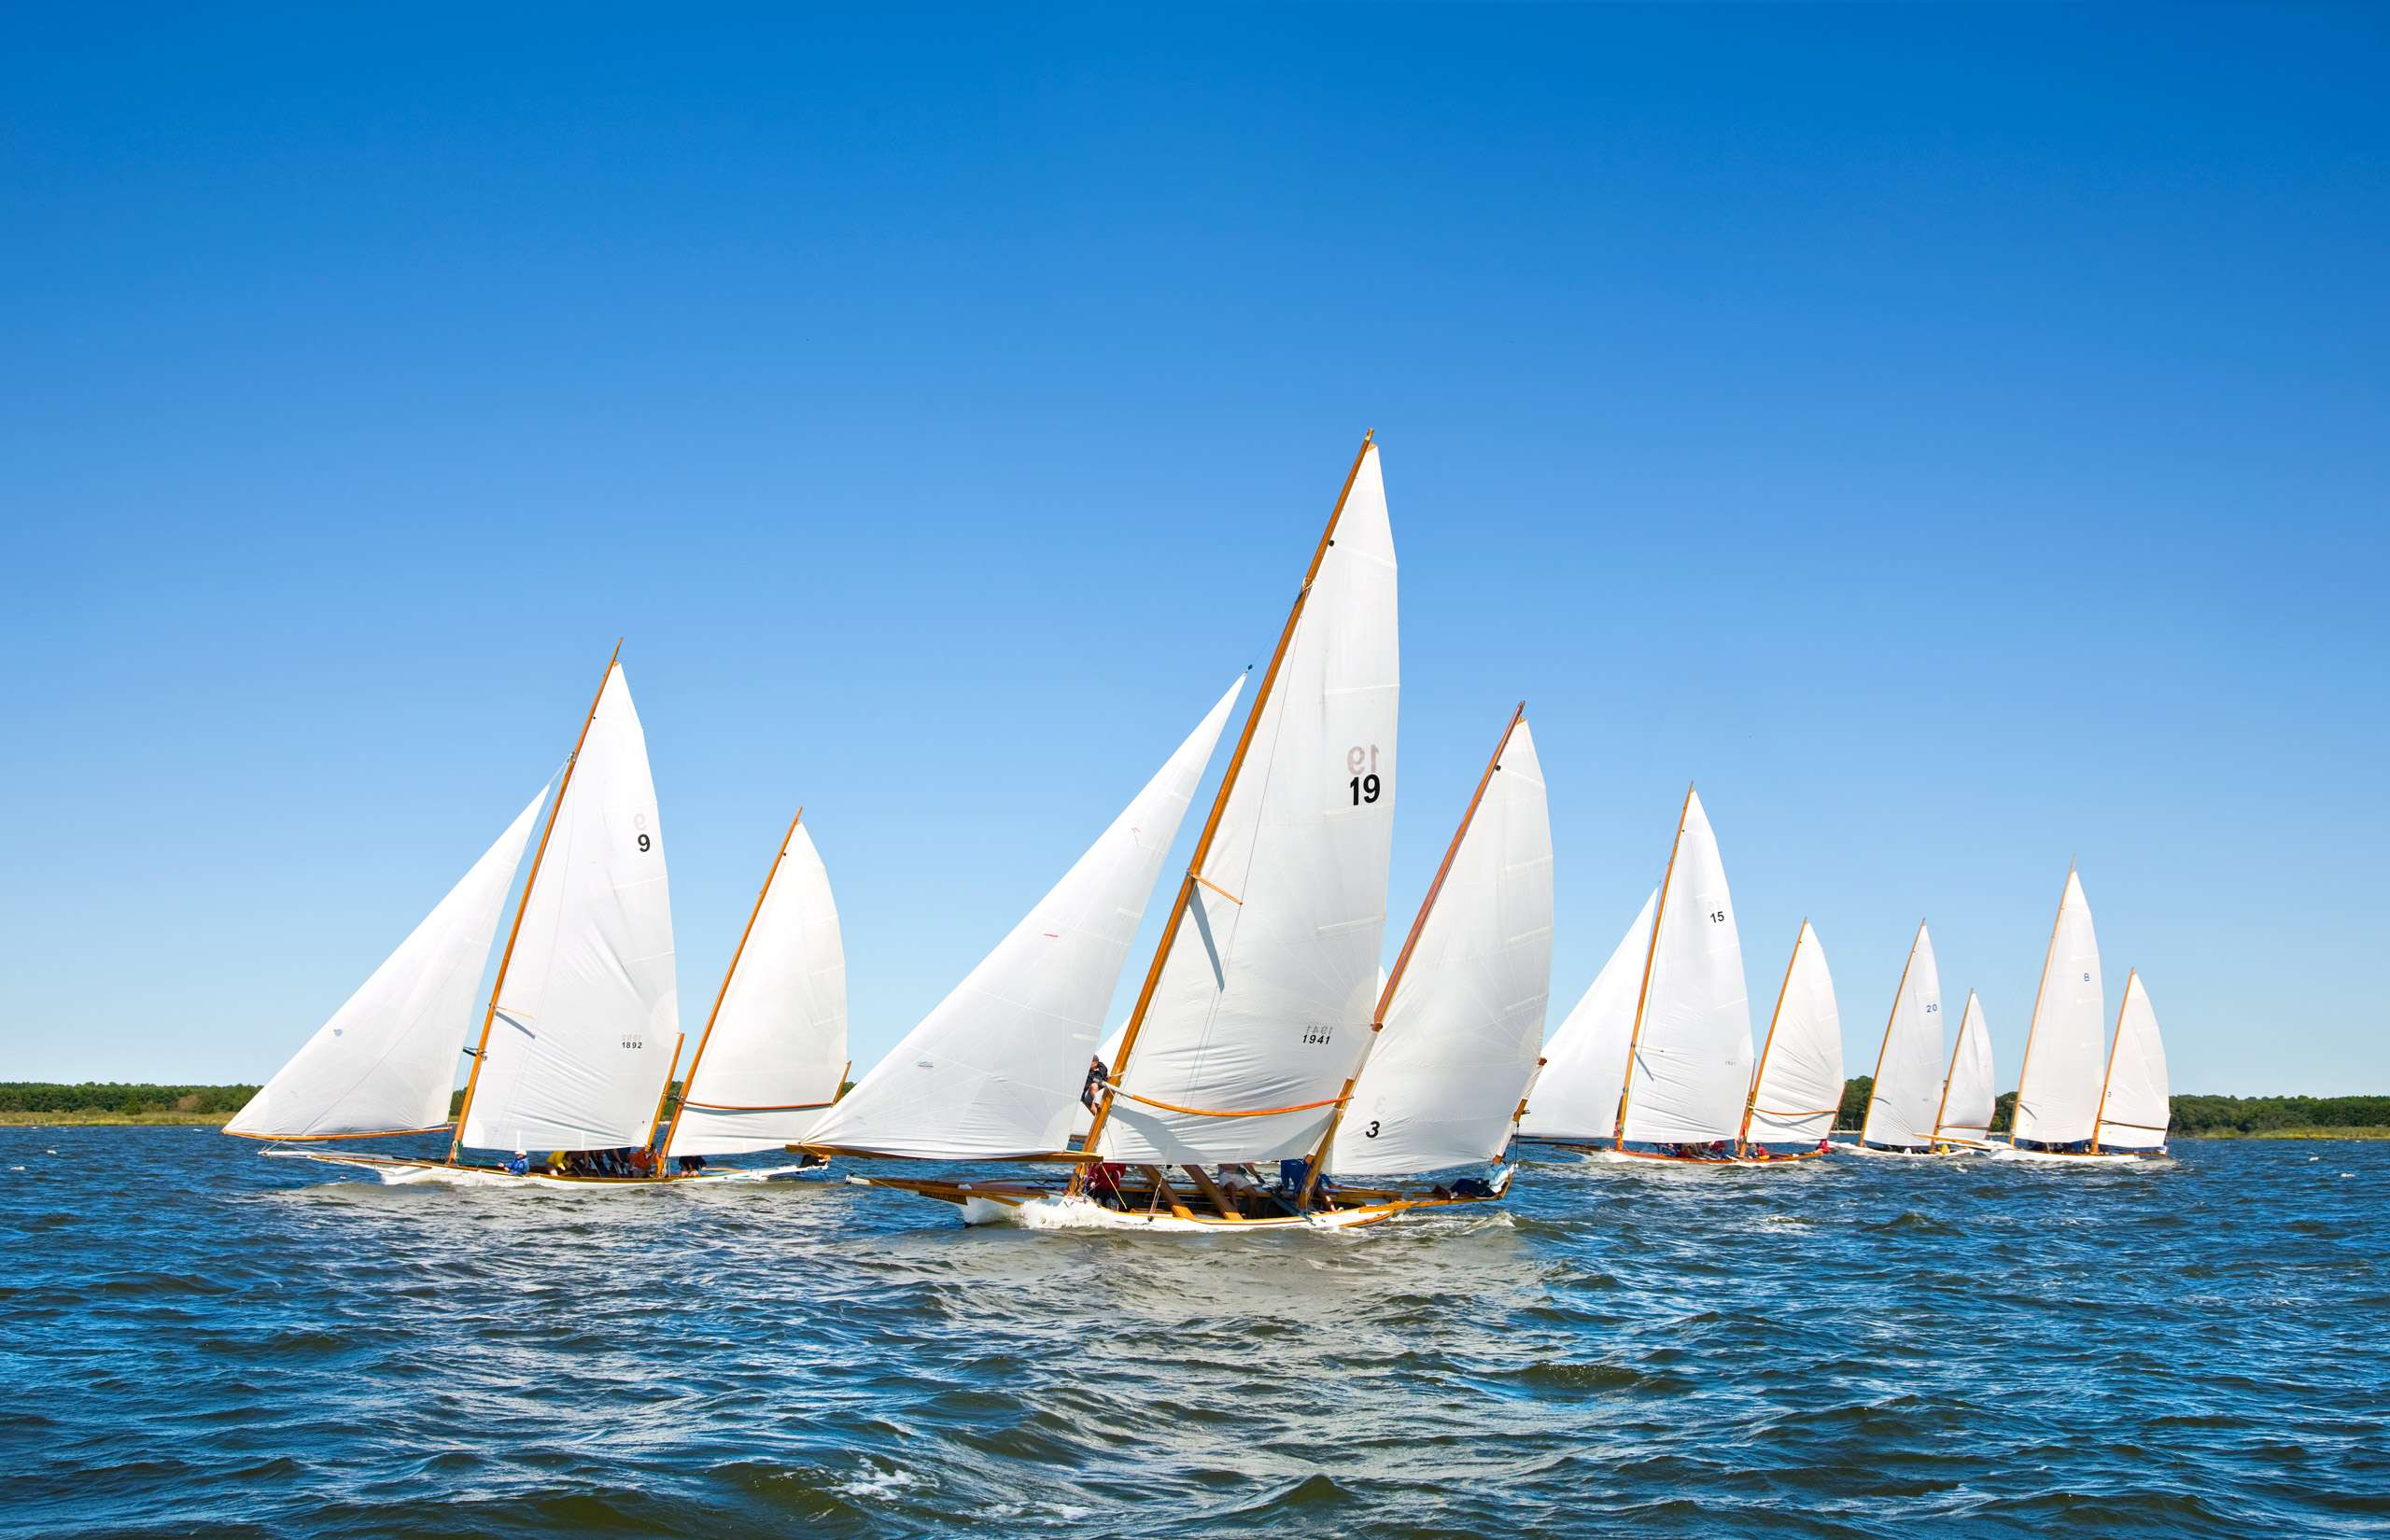 PORTFOLIO - Sailing - Log Canoes #8   PCG476